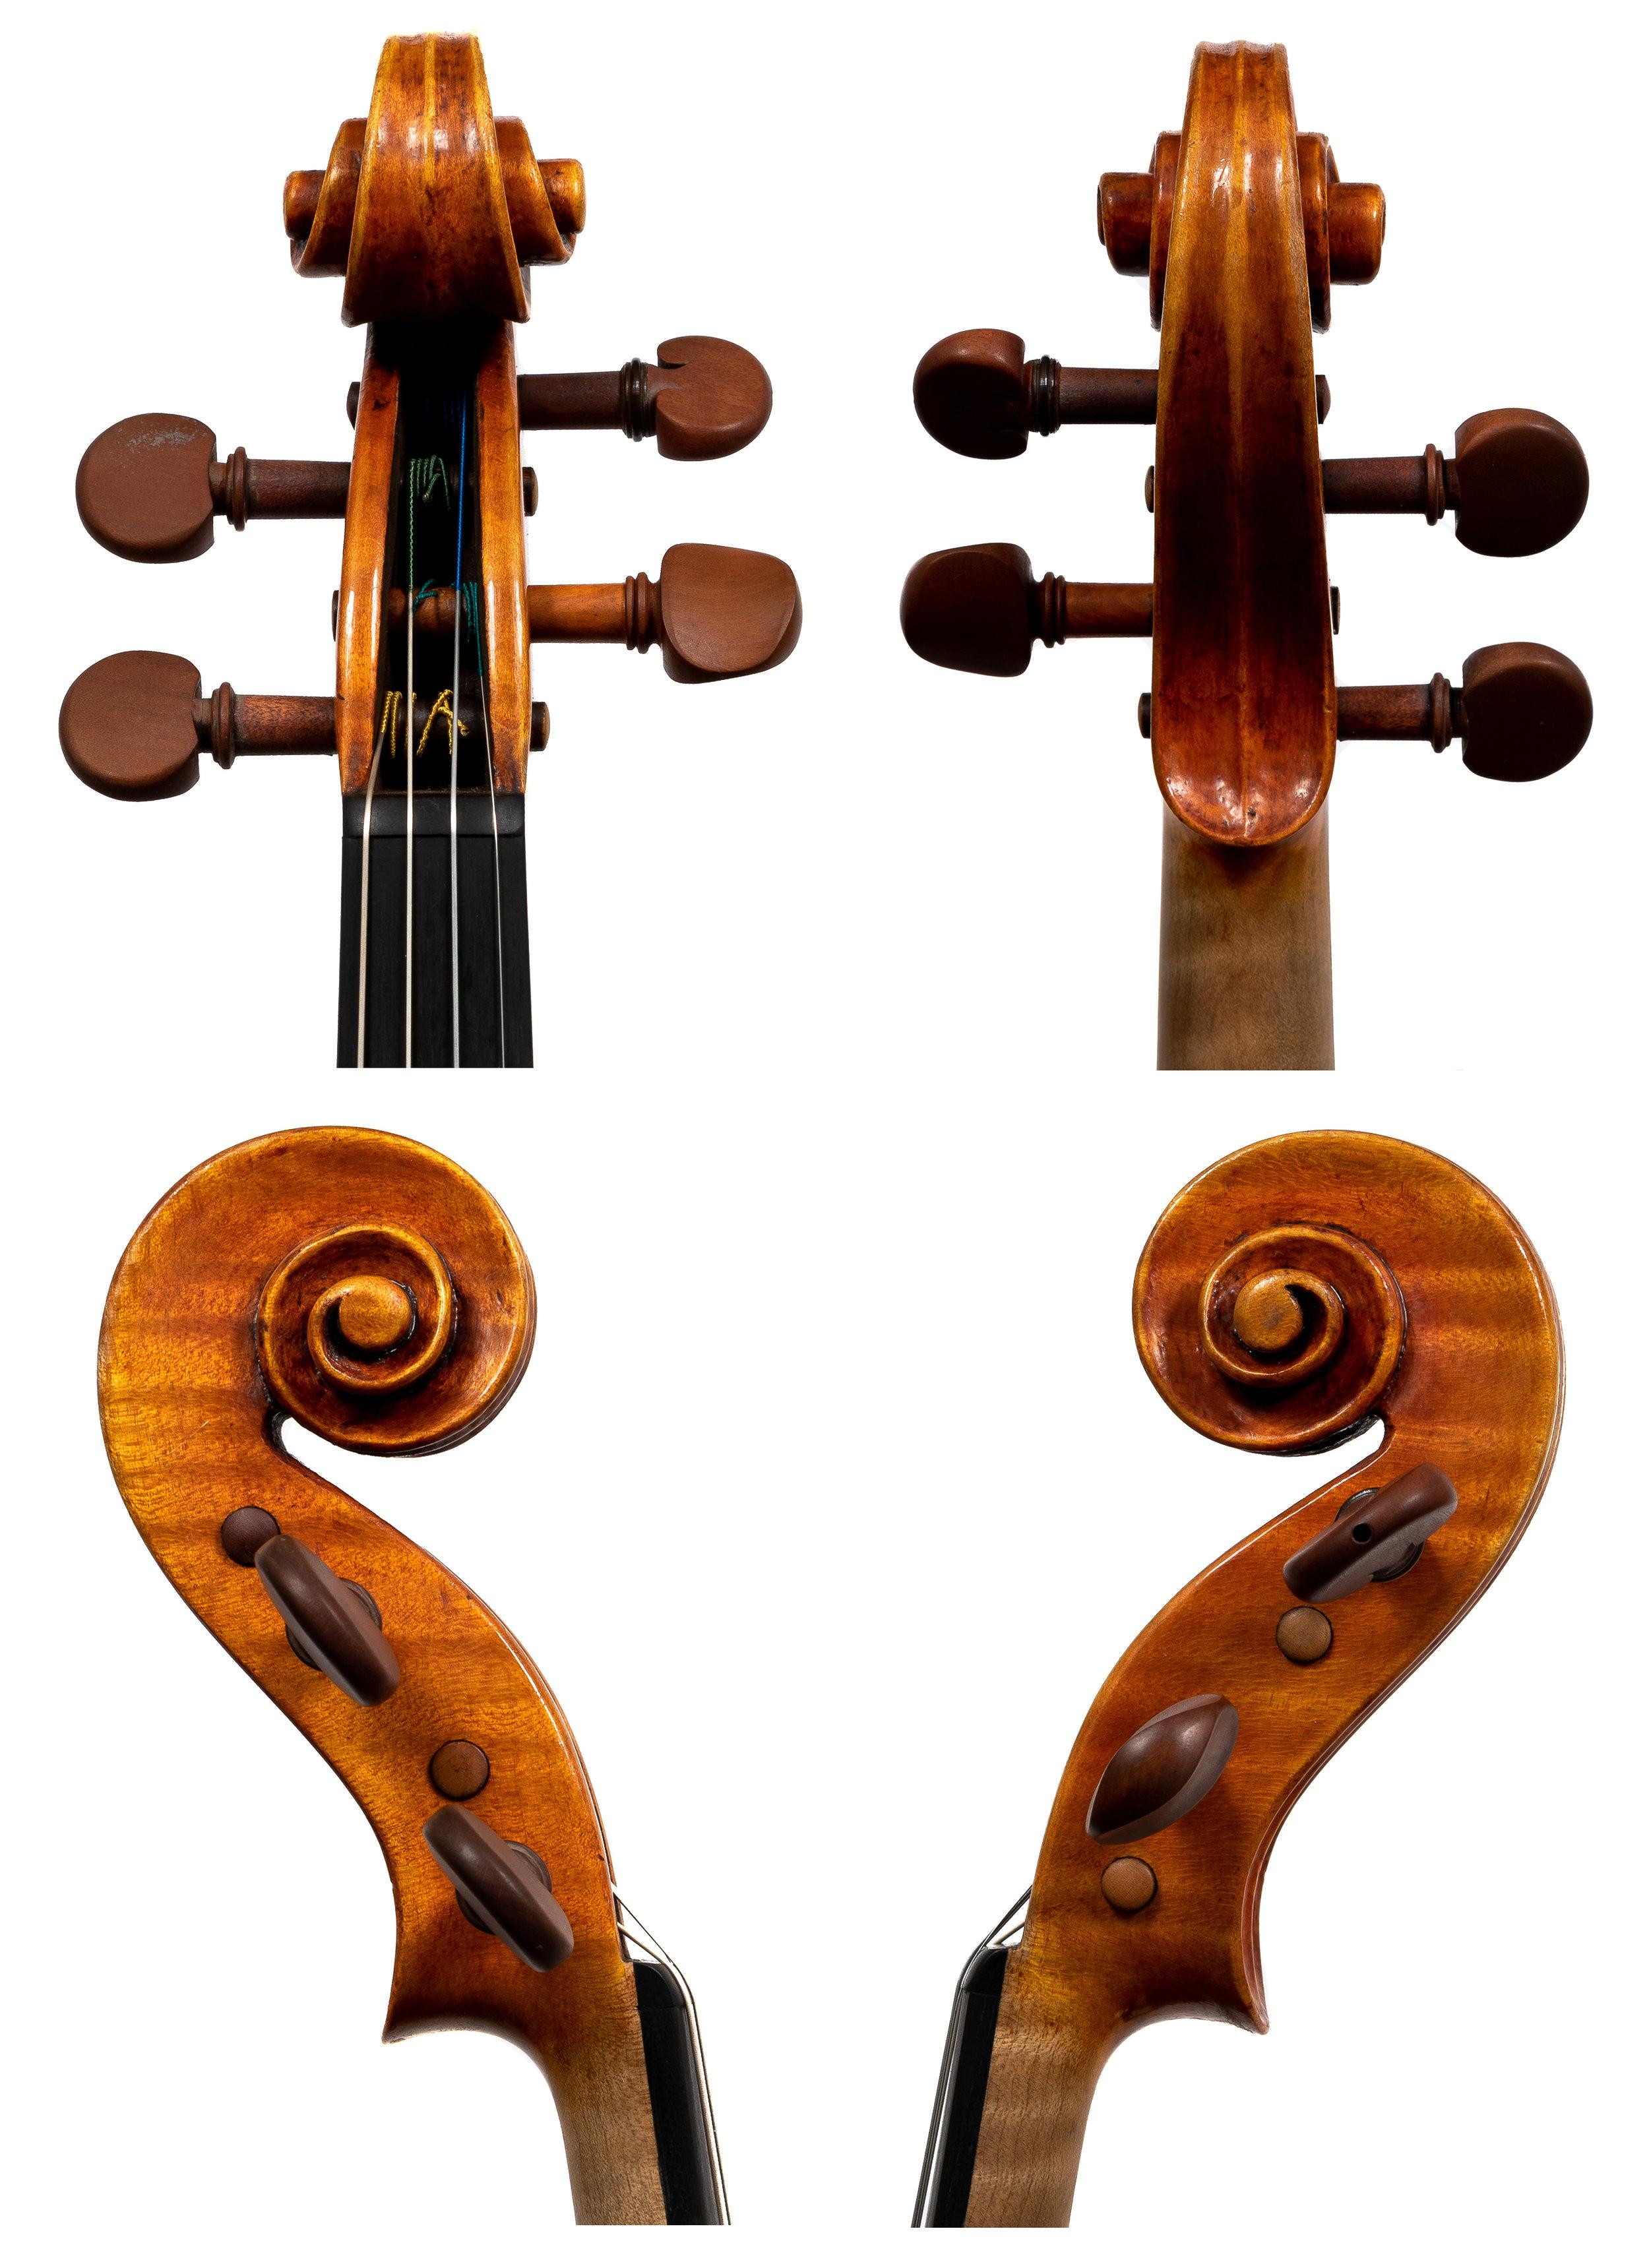 Matsuda Violin, Barrington, 2013